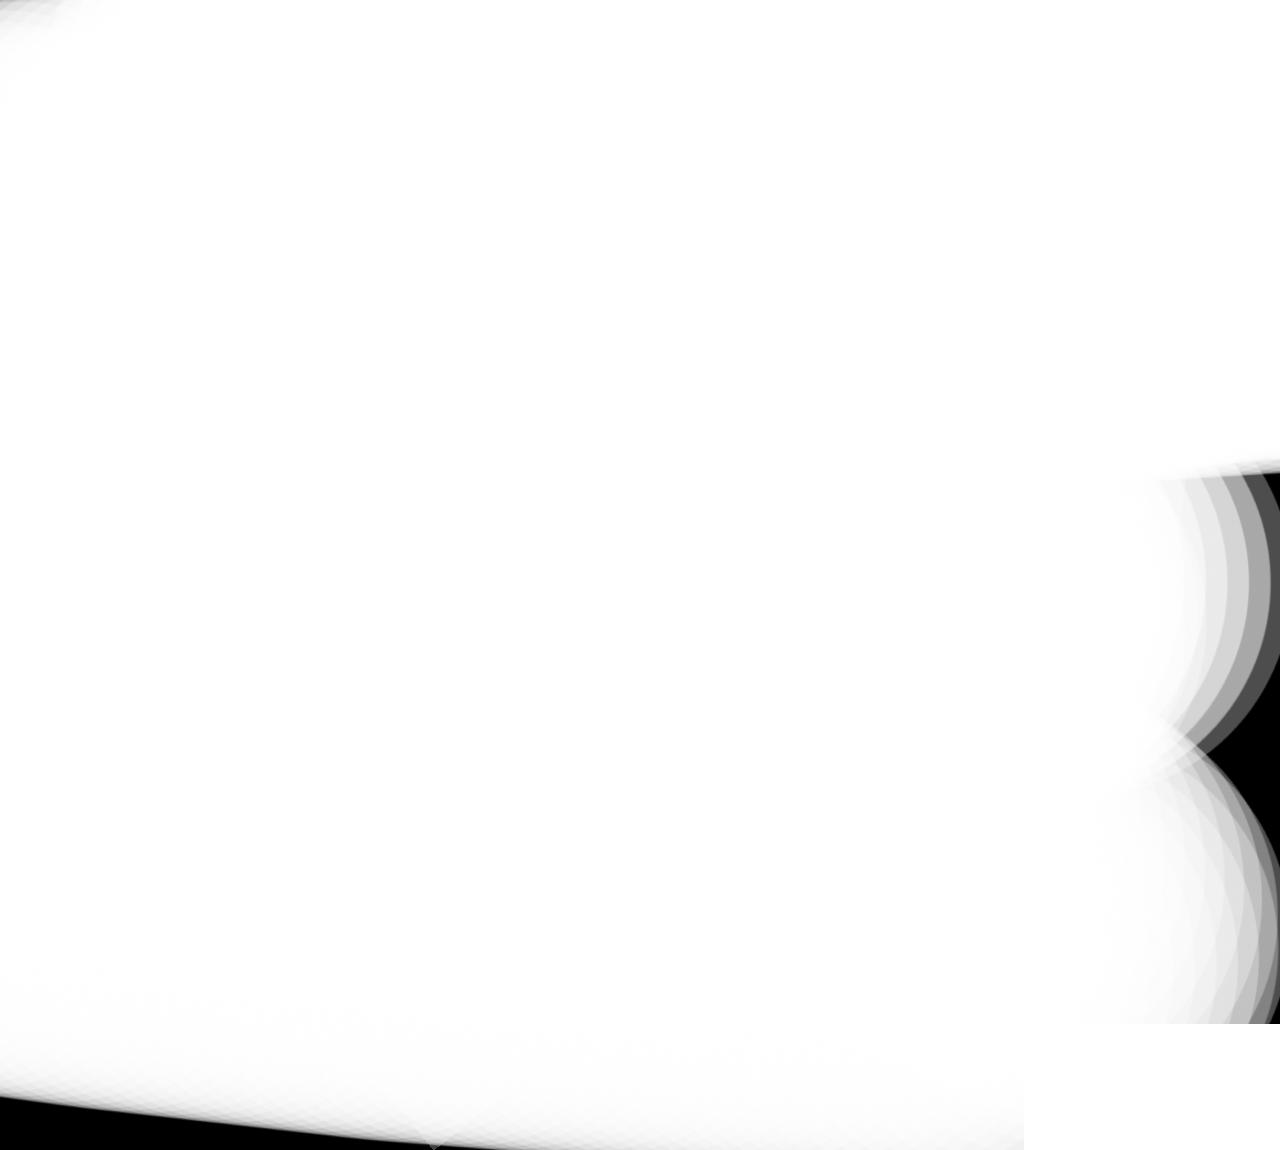 lightericon